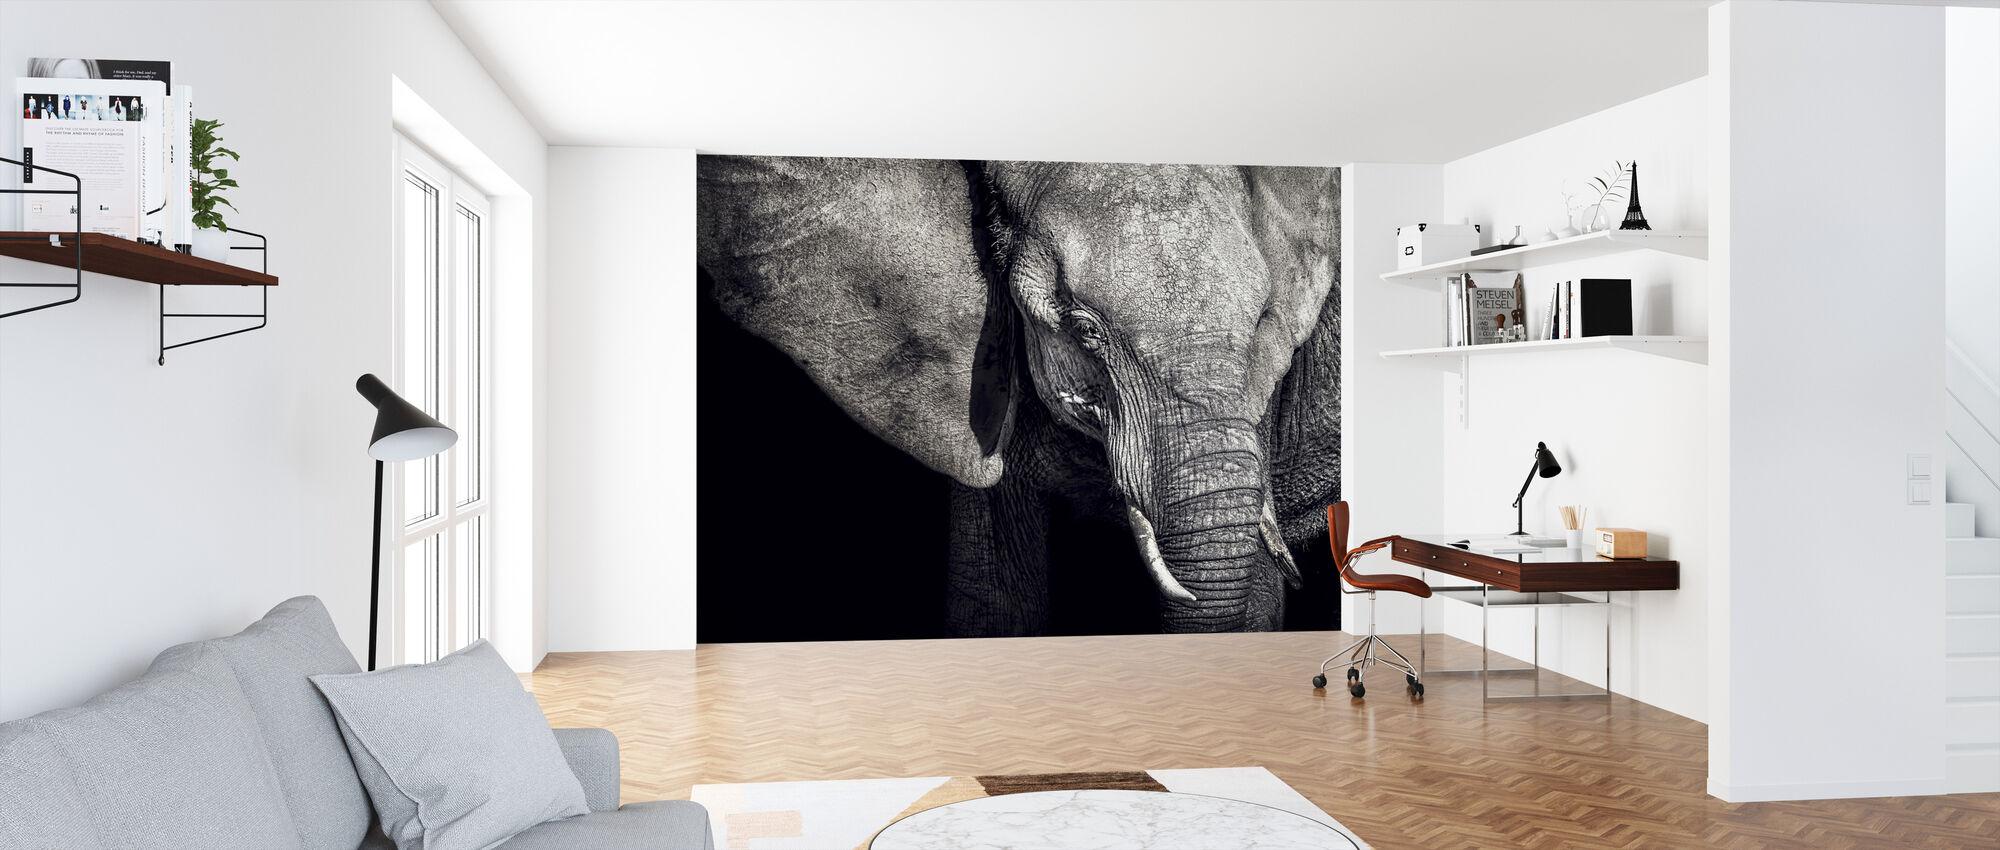 Beautiful Elephant - Wallpaper - Office